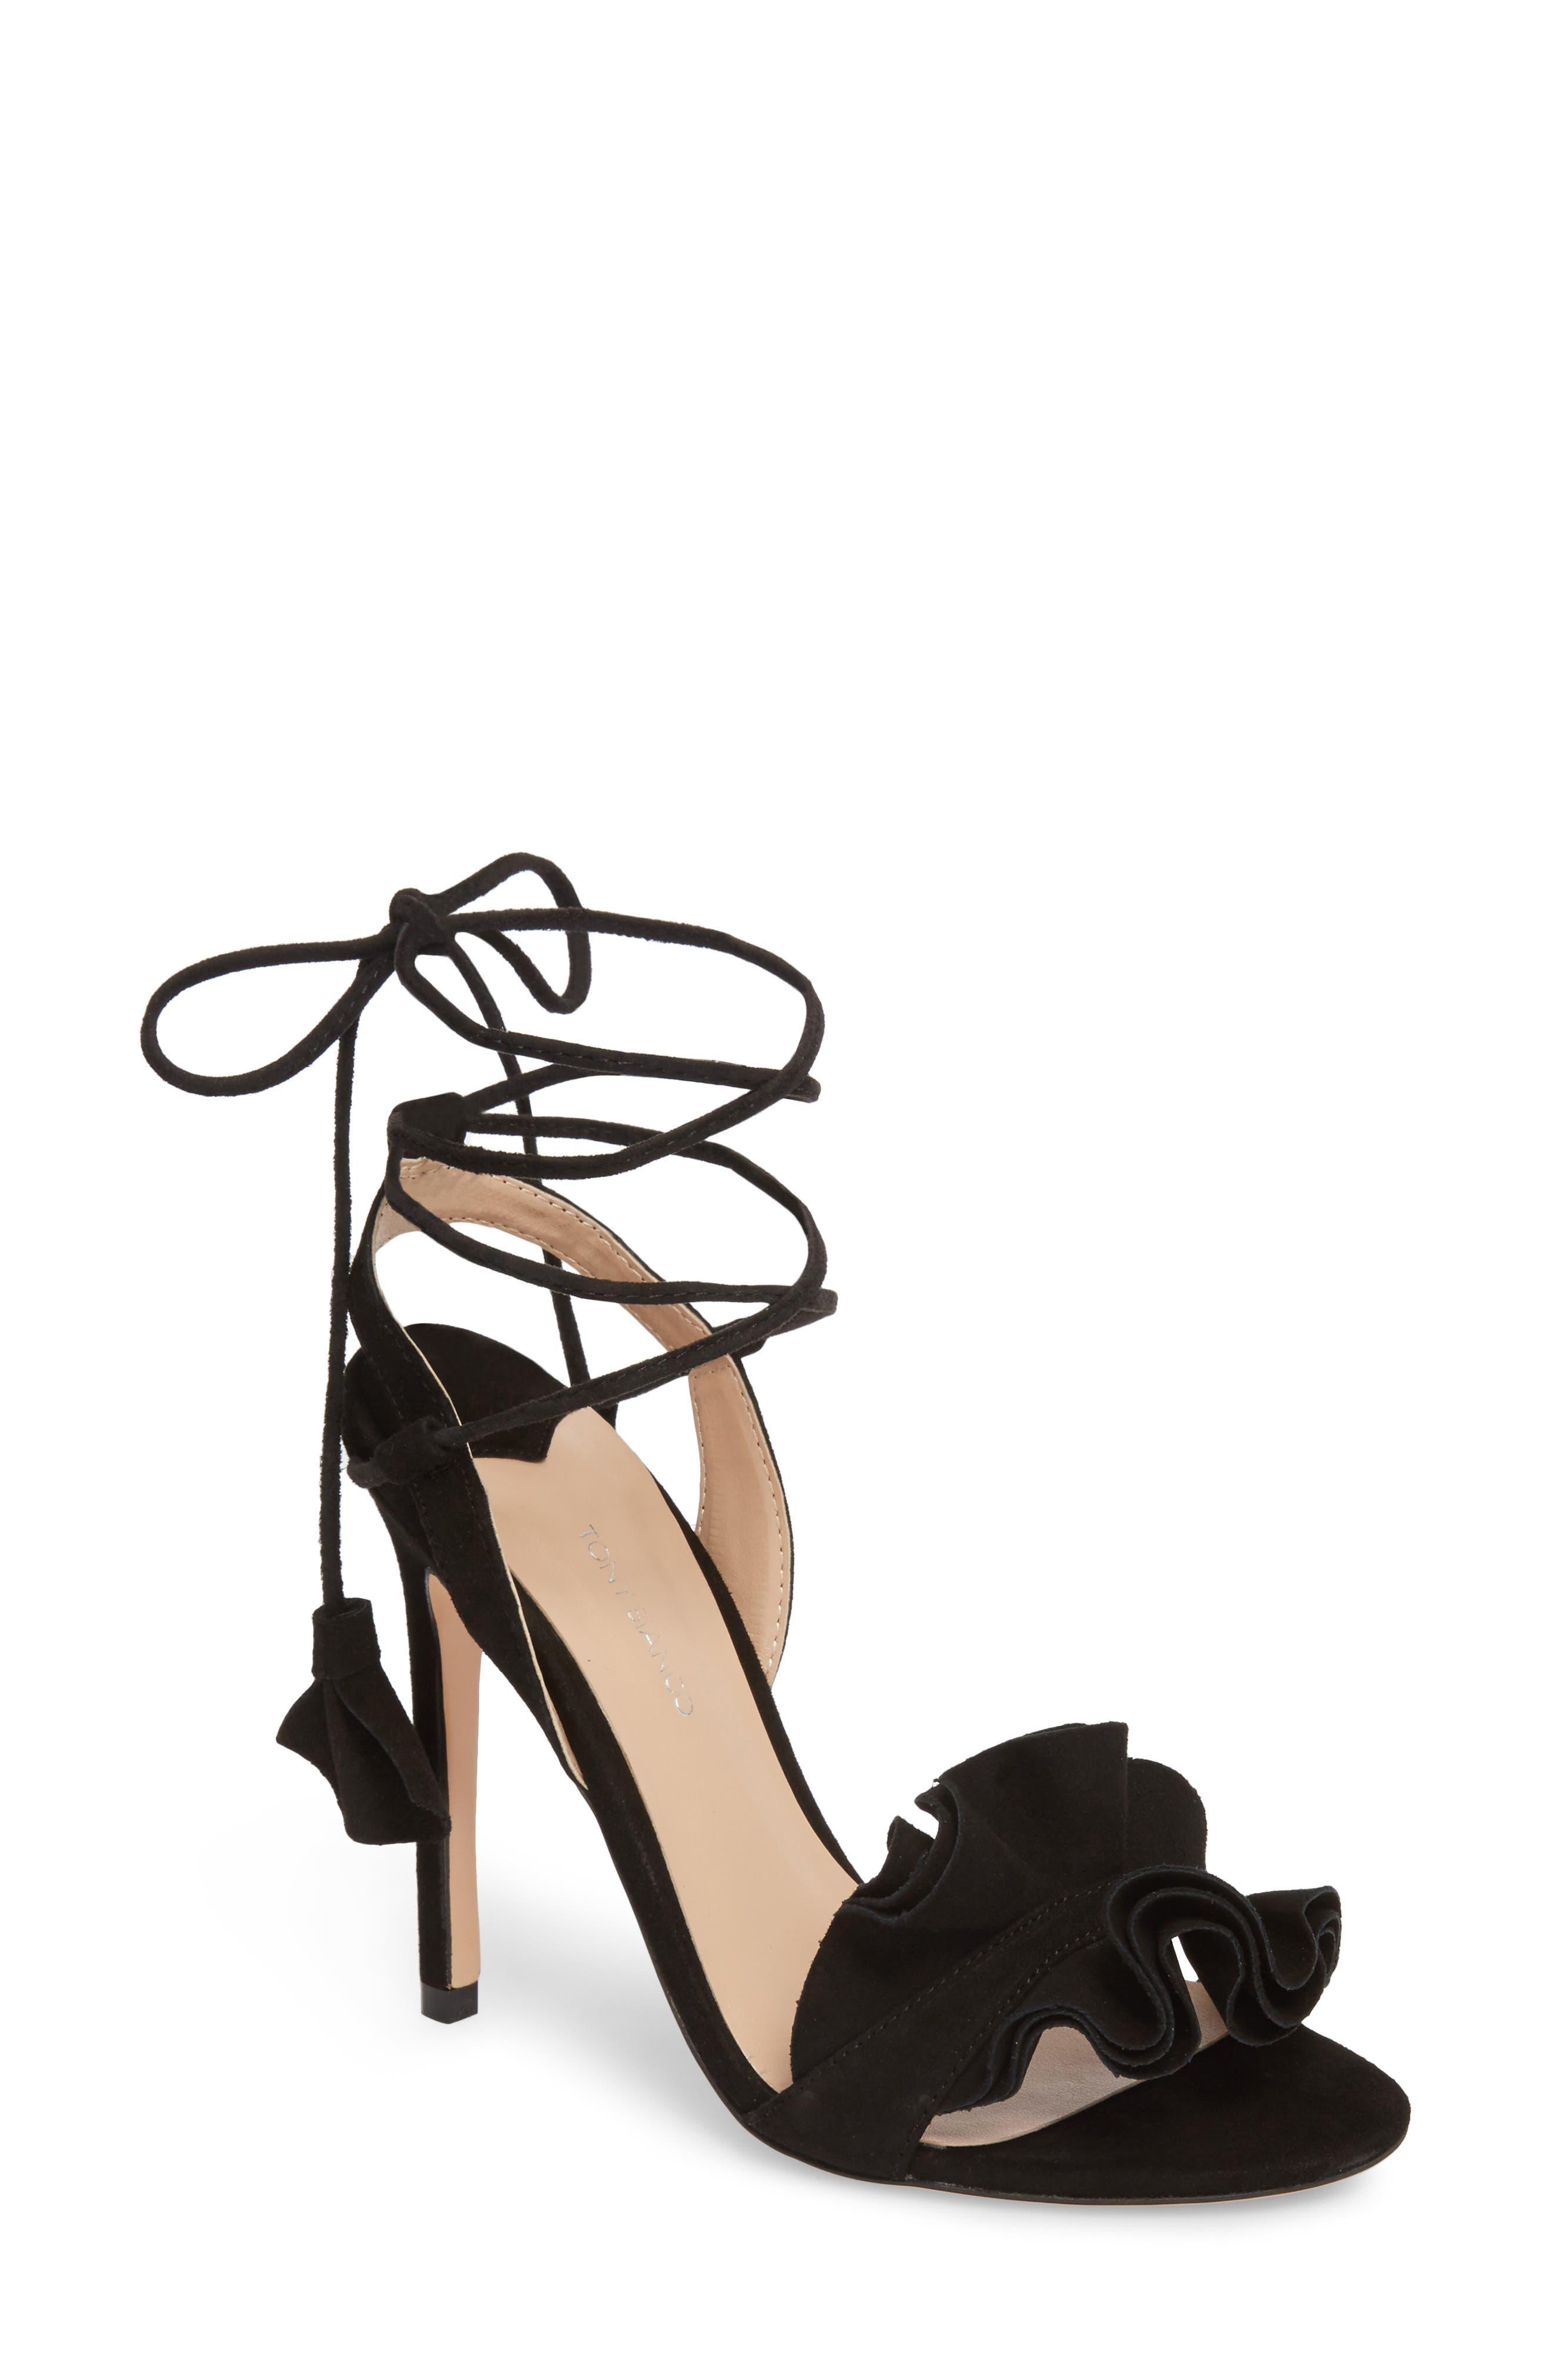 Kalipso Ruffled Wraparound Sandal,                             Main thumbnail 1, color,                             Black Suede